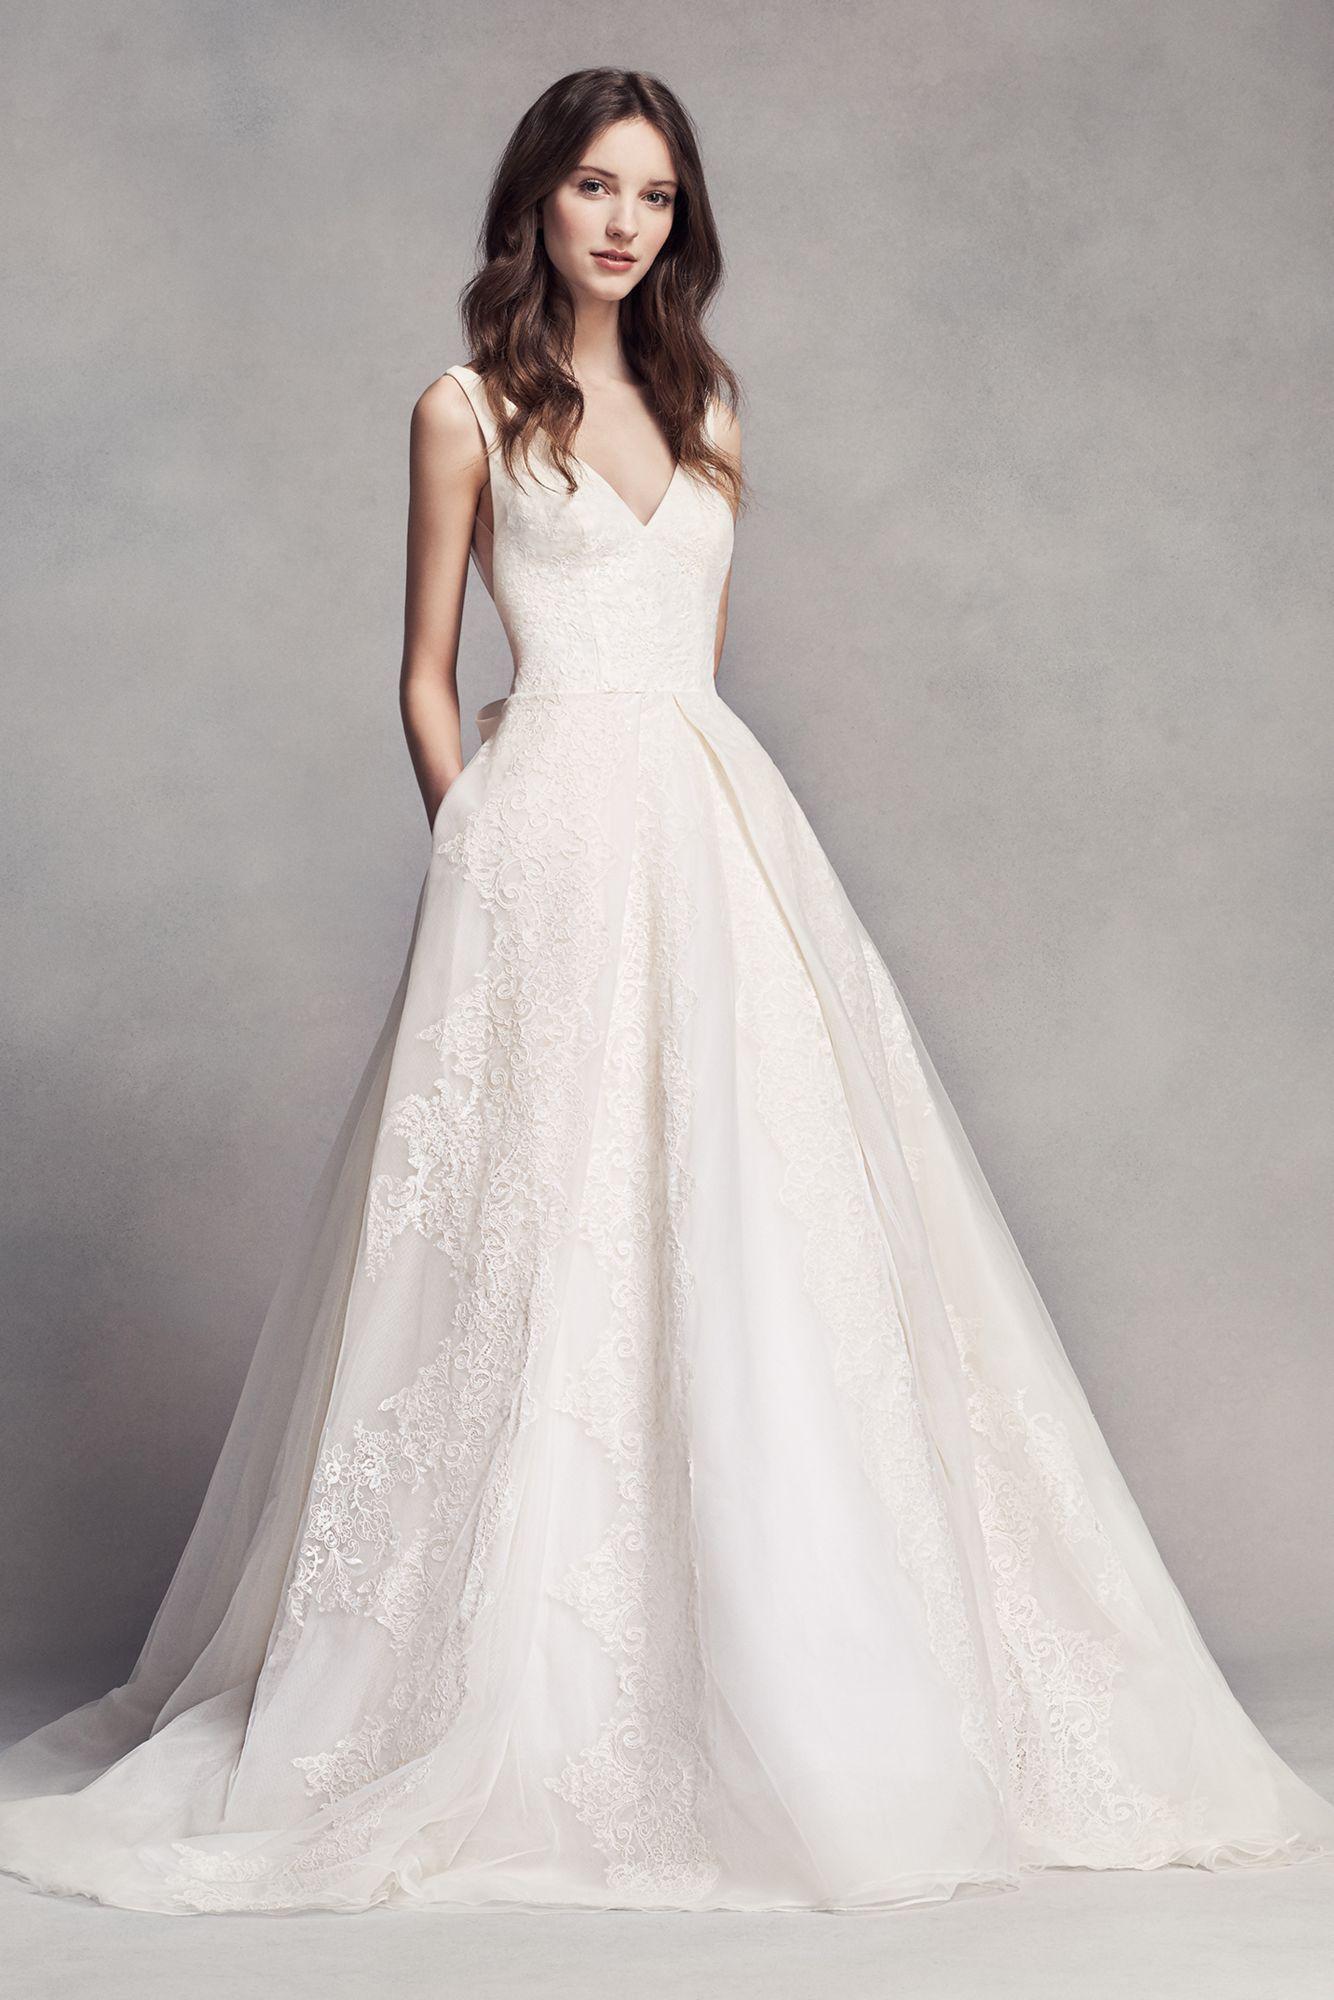 4xlvw351318 Style New Fashion Bow Emebllished White By Vera Wang A Line Long V Neck Wedding Dress V Neck Wedding Dress Bow Wedding Dress Wedding Dresses